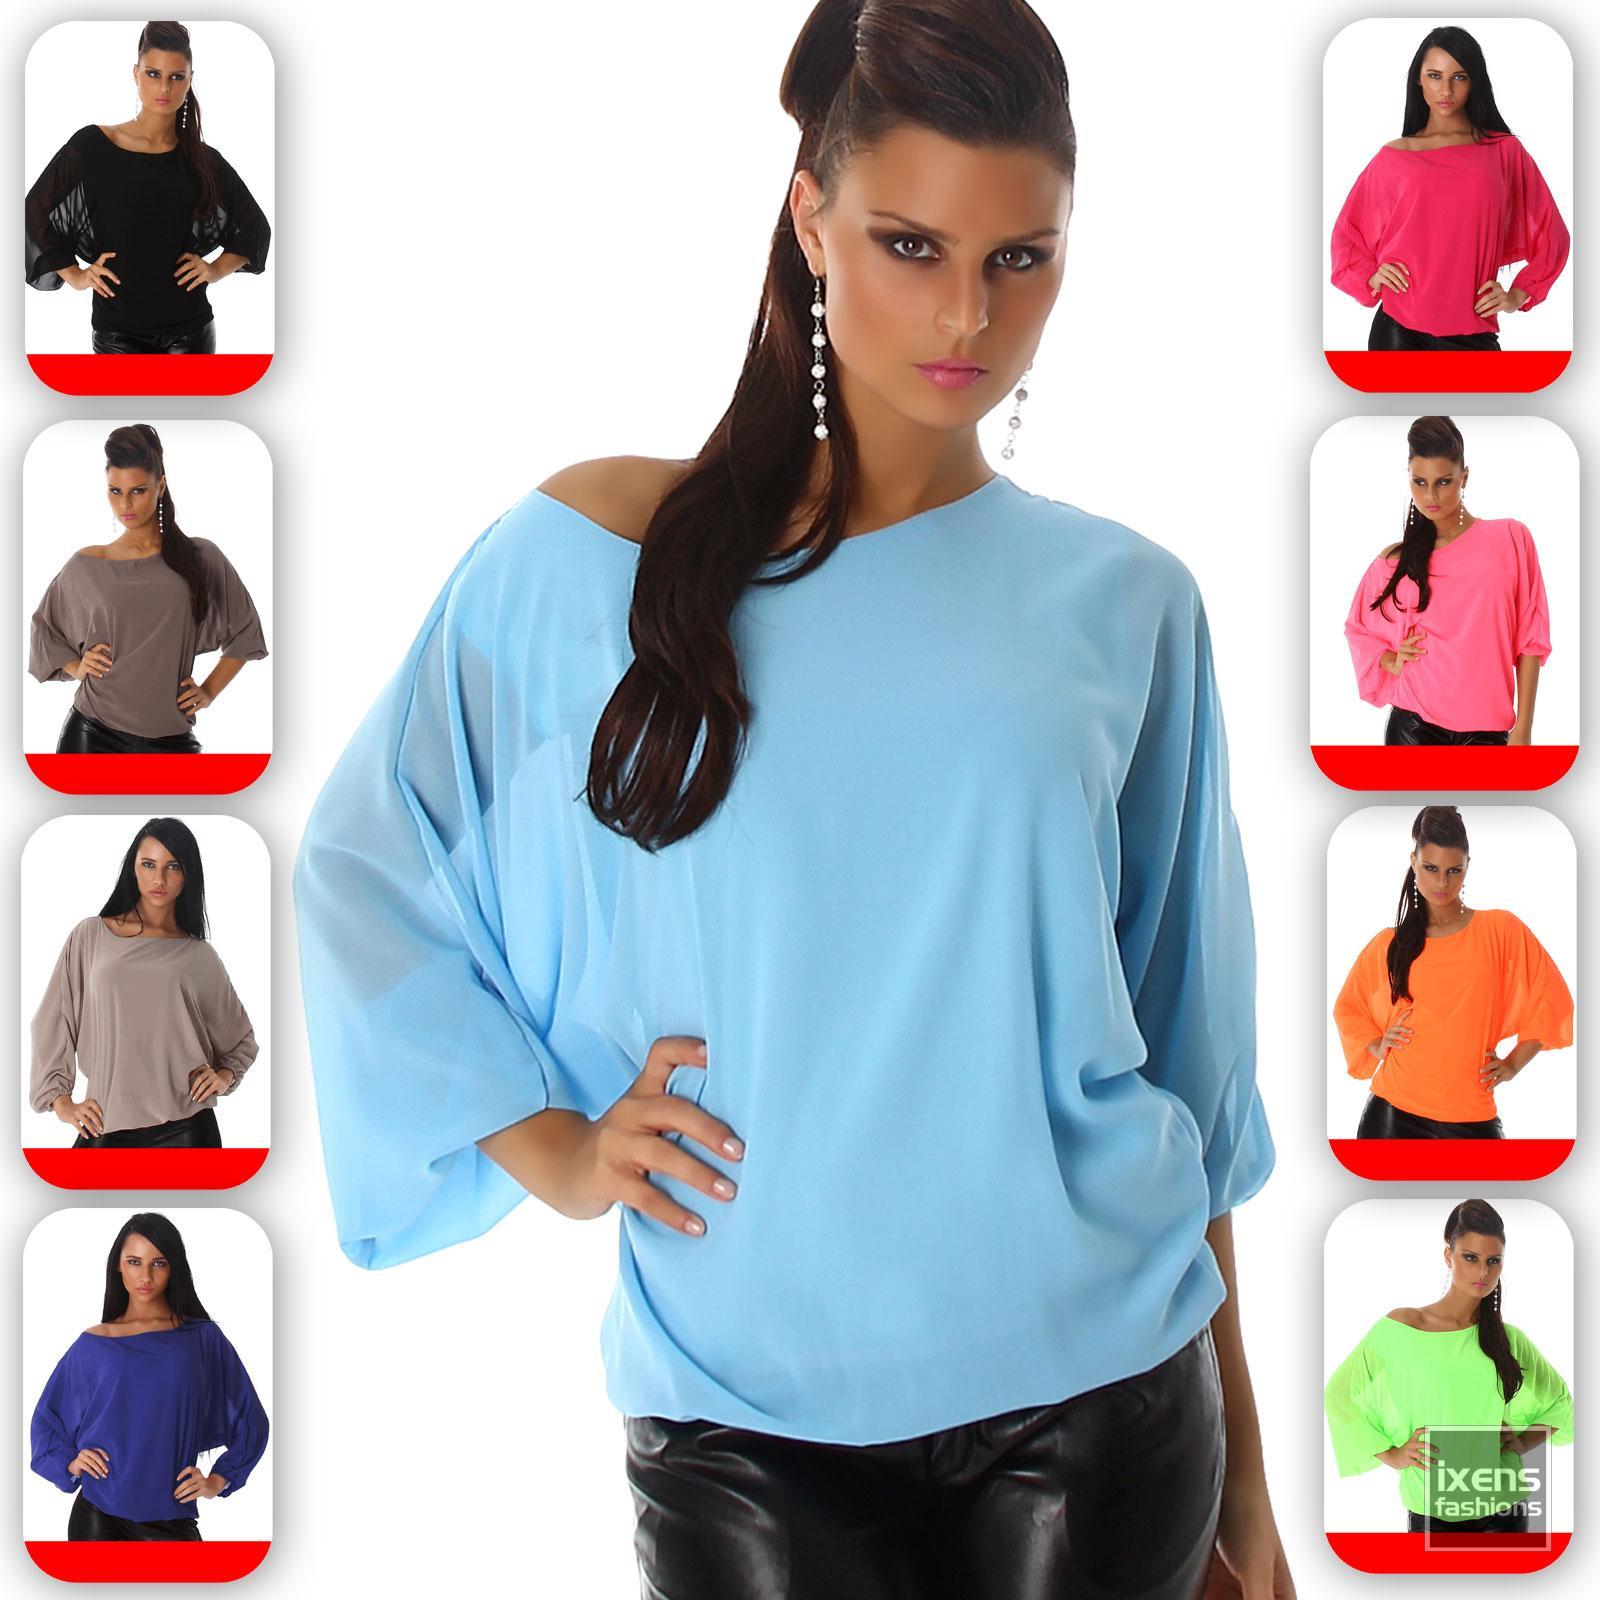 damen top shirt langarmshirt bluse oberteil sweatshirt. Black Bedroom Furniture Sets. Home Design Ideas